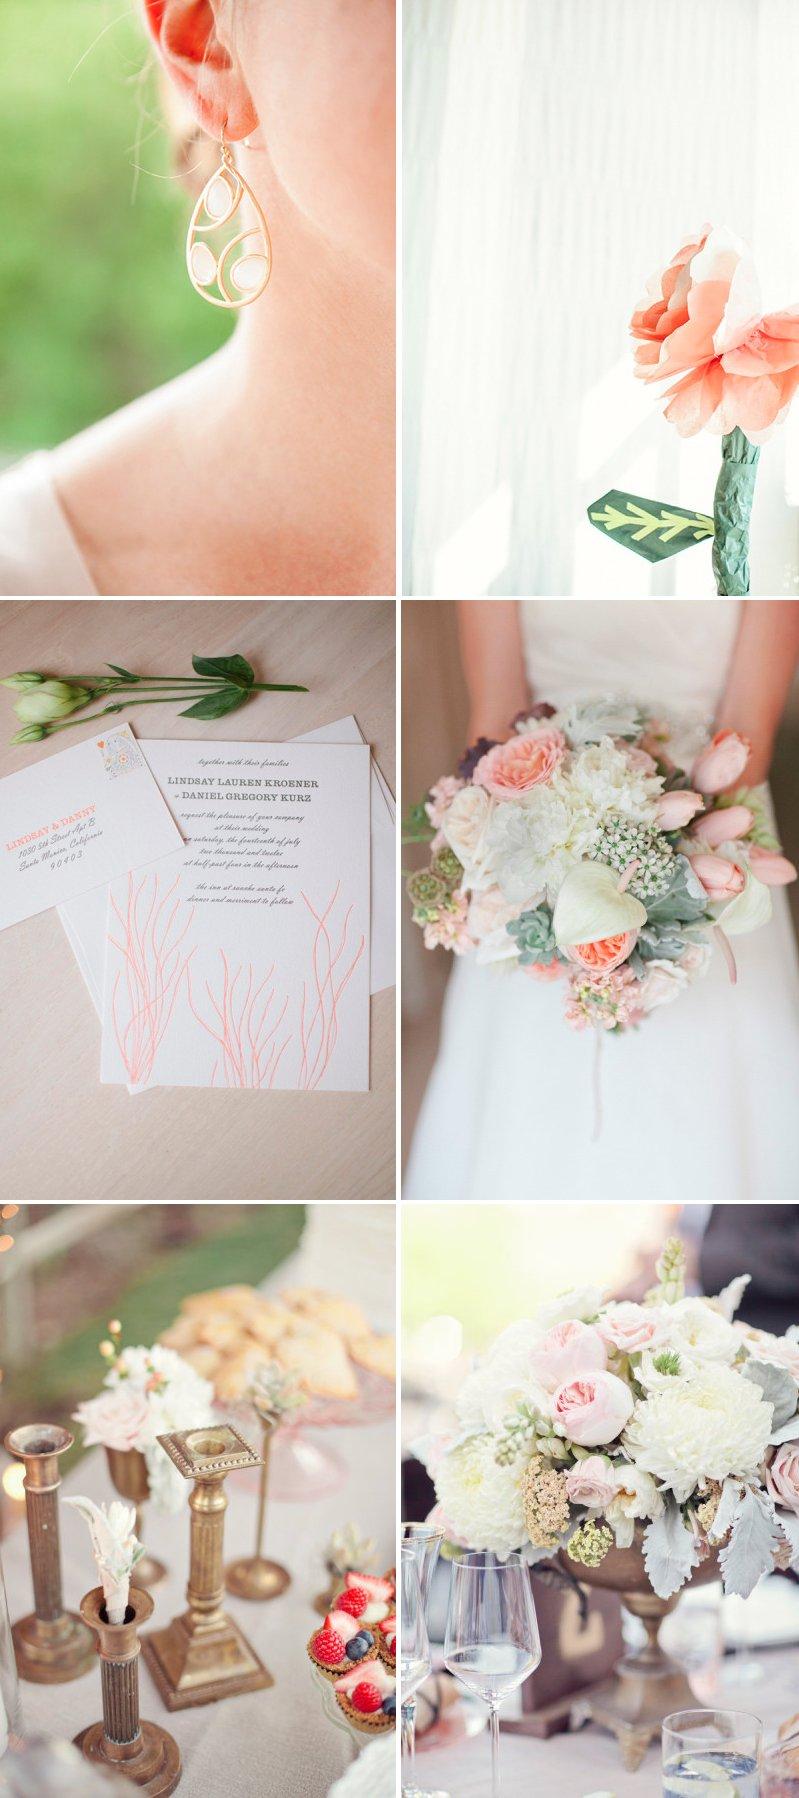 Peach-cream-gold-wedding-colors-romantic-wedding-ideas-2.full